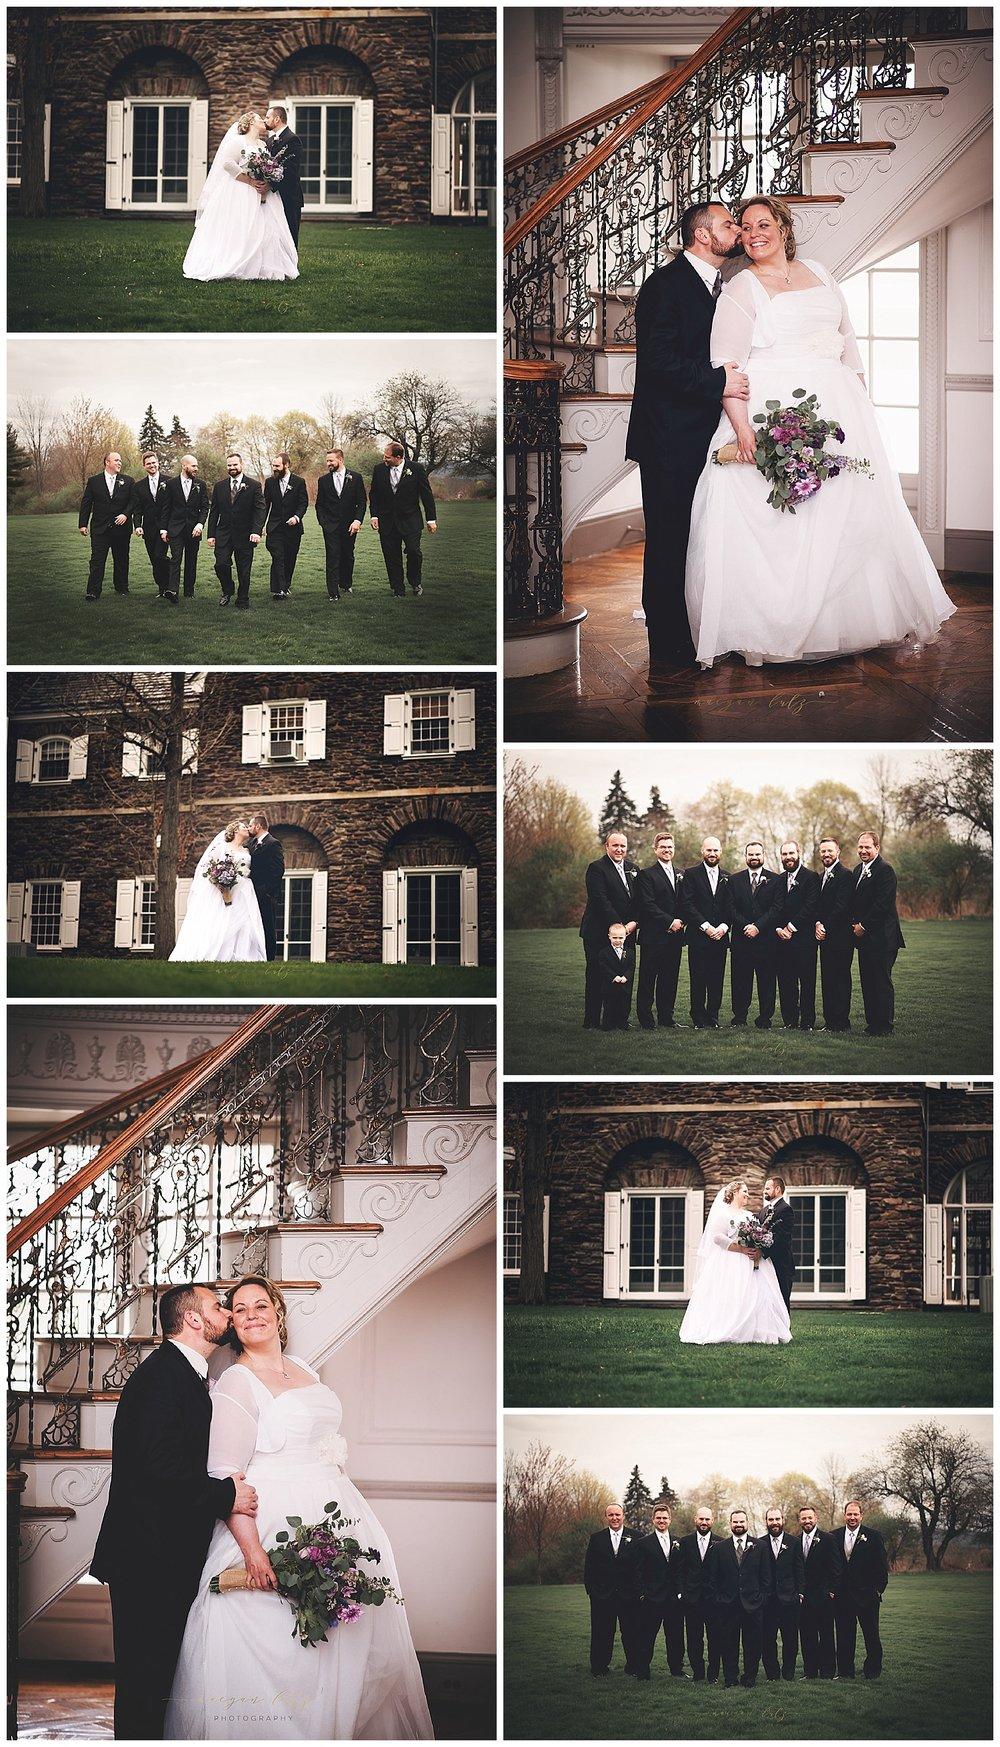 Scranton-Wedding-Photographer-in-LeHigh-Valley-NEPA_0033.jpg